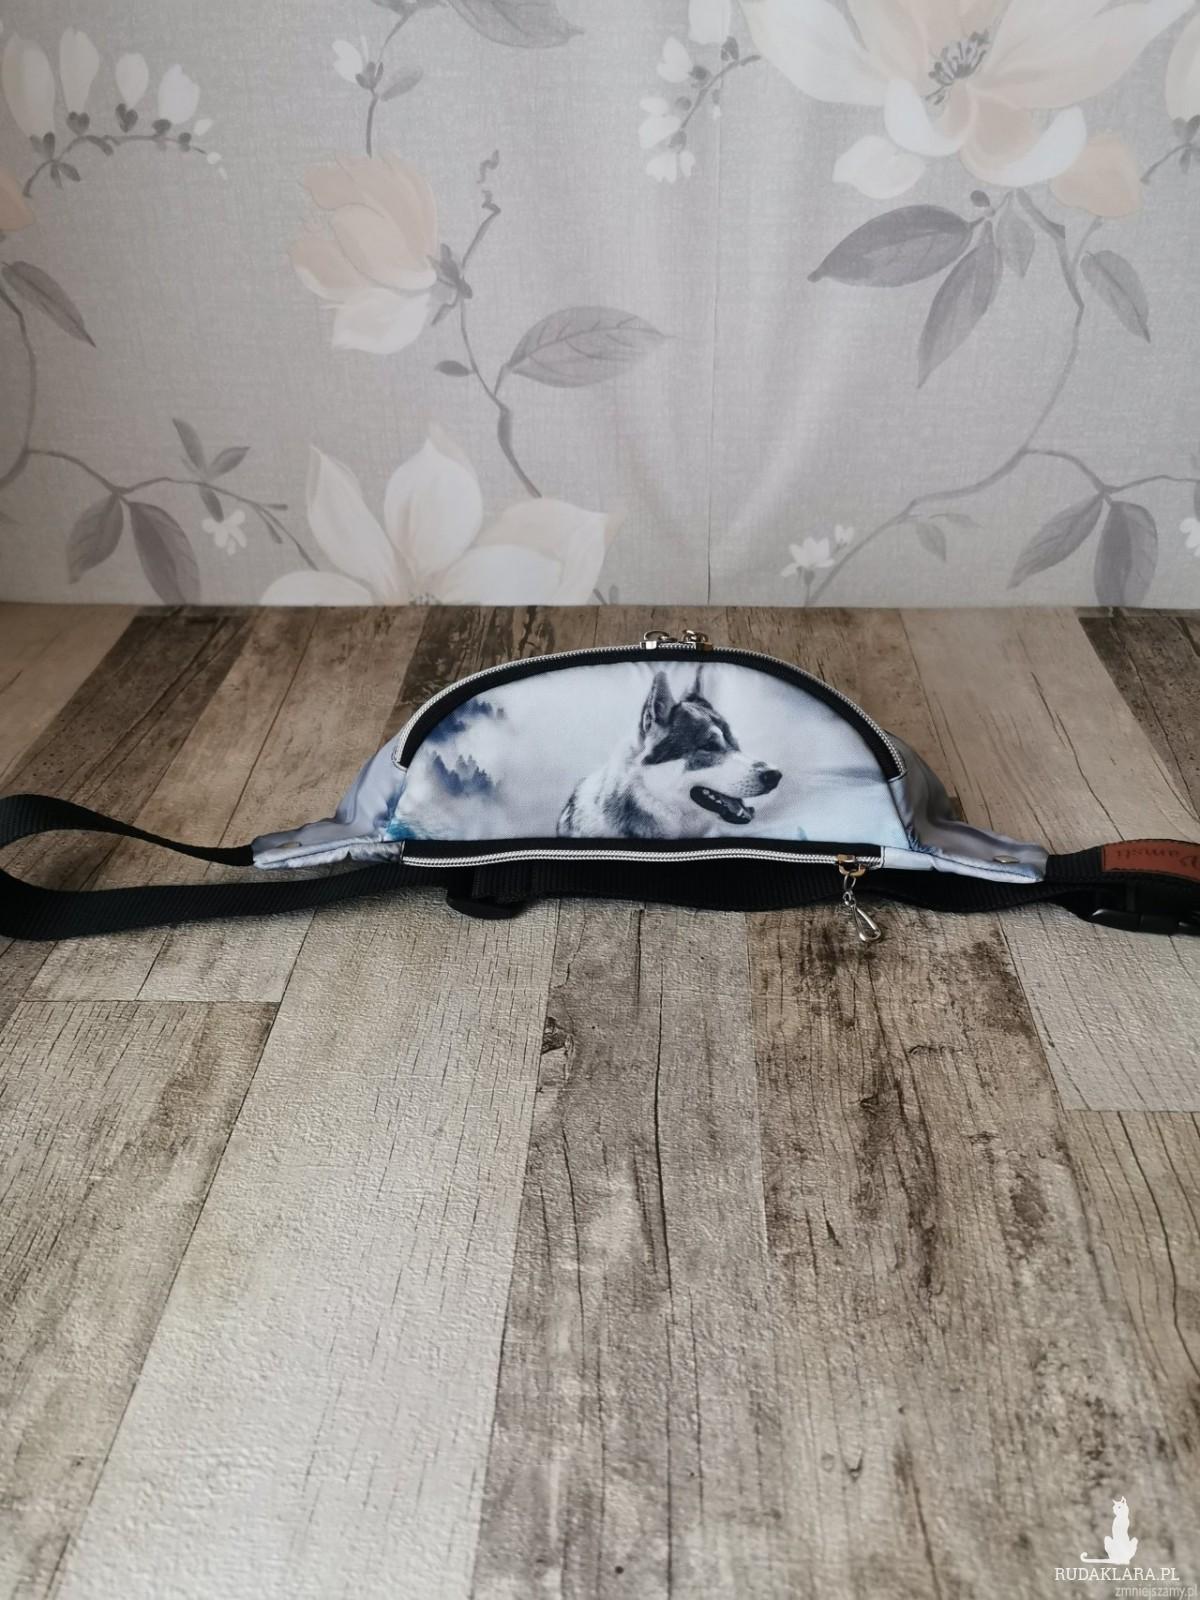 Nerka saszetka biodrowa wodoodporna handmade torebka na pas torebka na ramię torba mini wilk